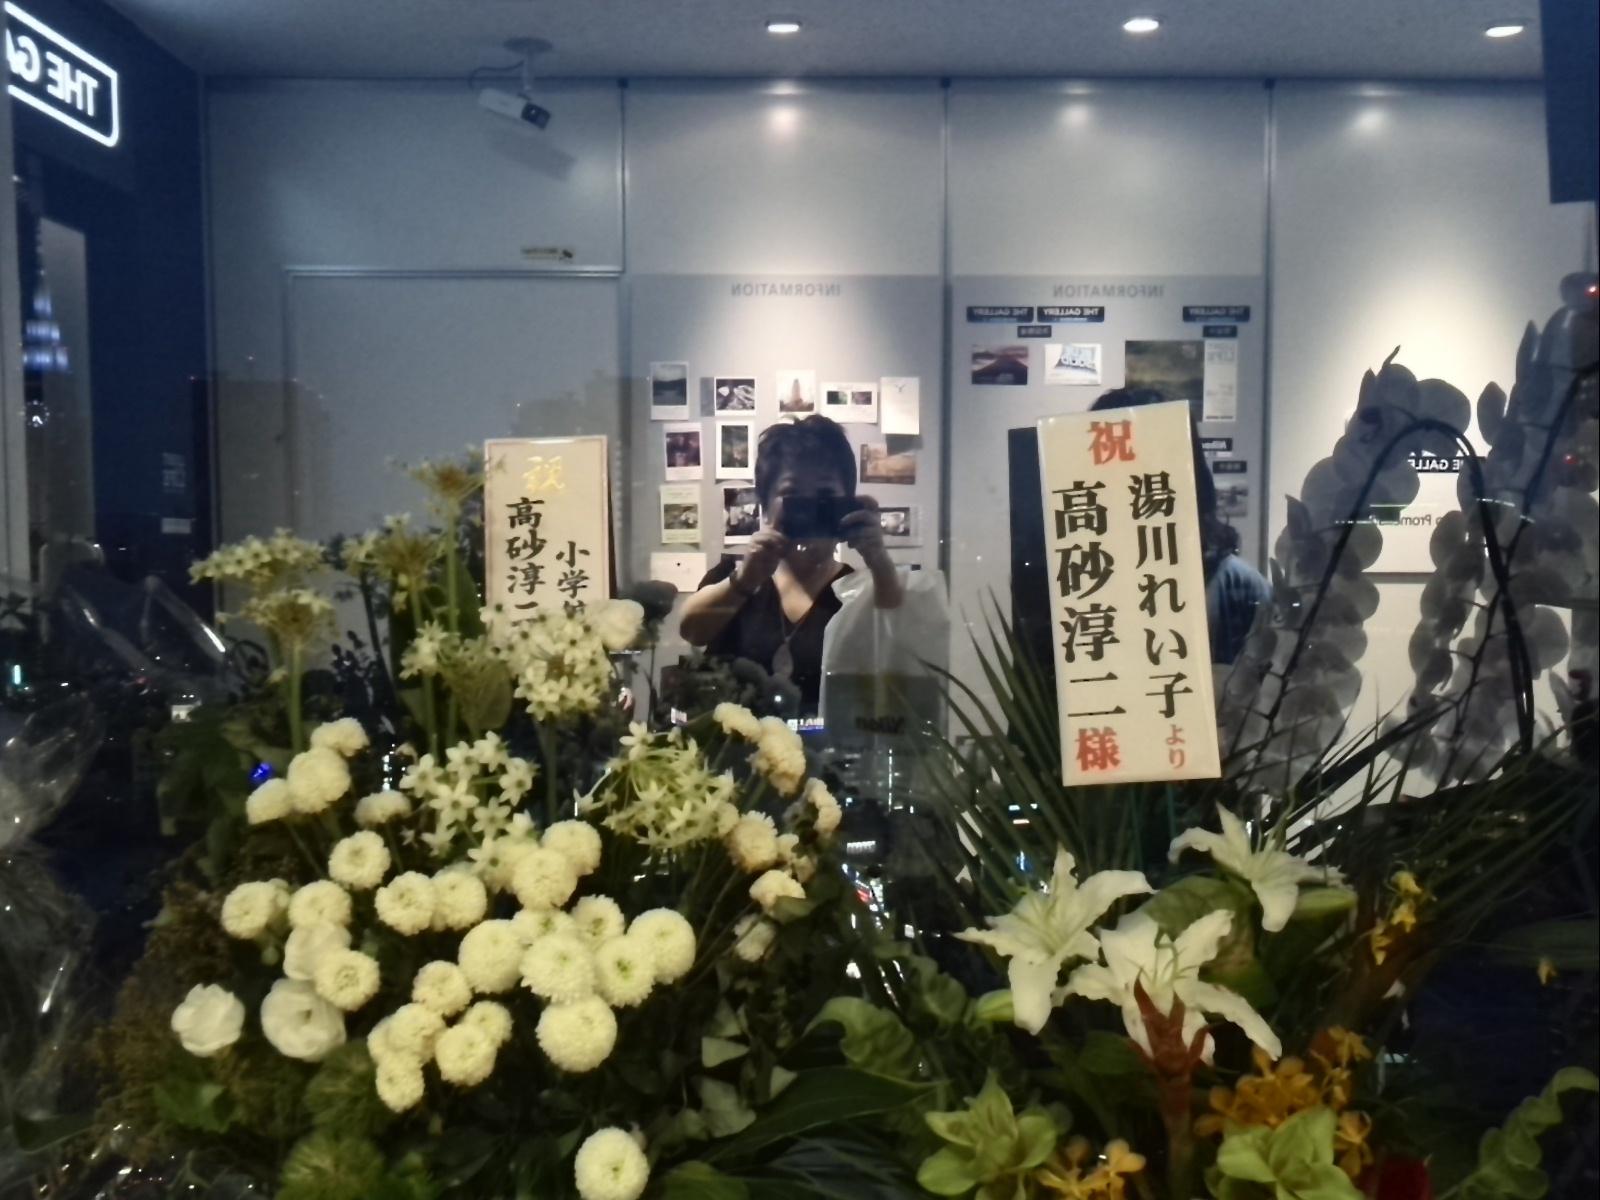 #atelierフォルマーレにてセミナー #高砂淳二写真展 #赤坂おもてなしビアガーデン!_f0340942_23343140.jpg